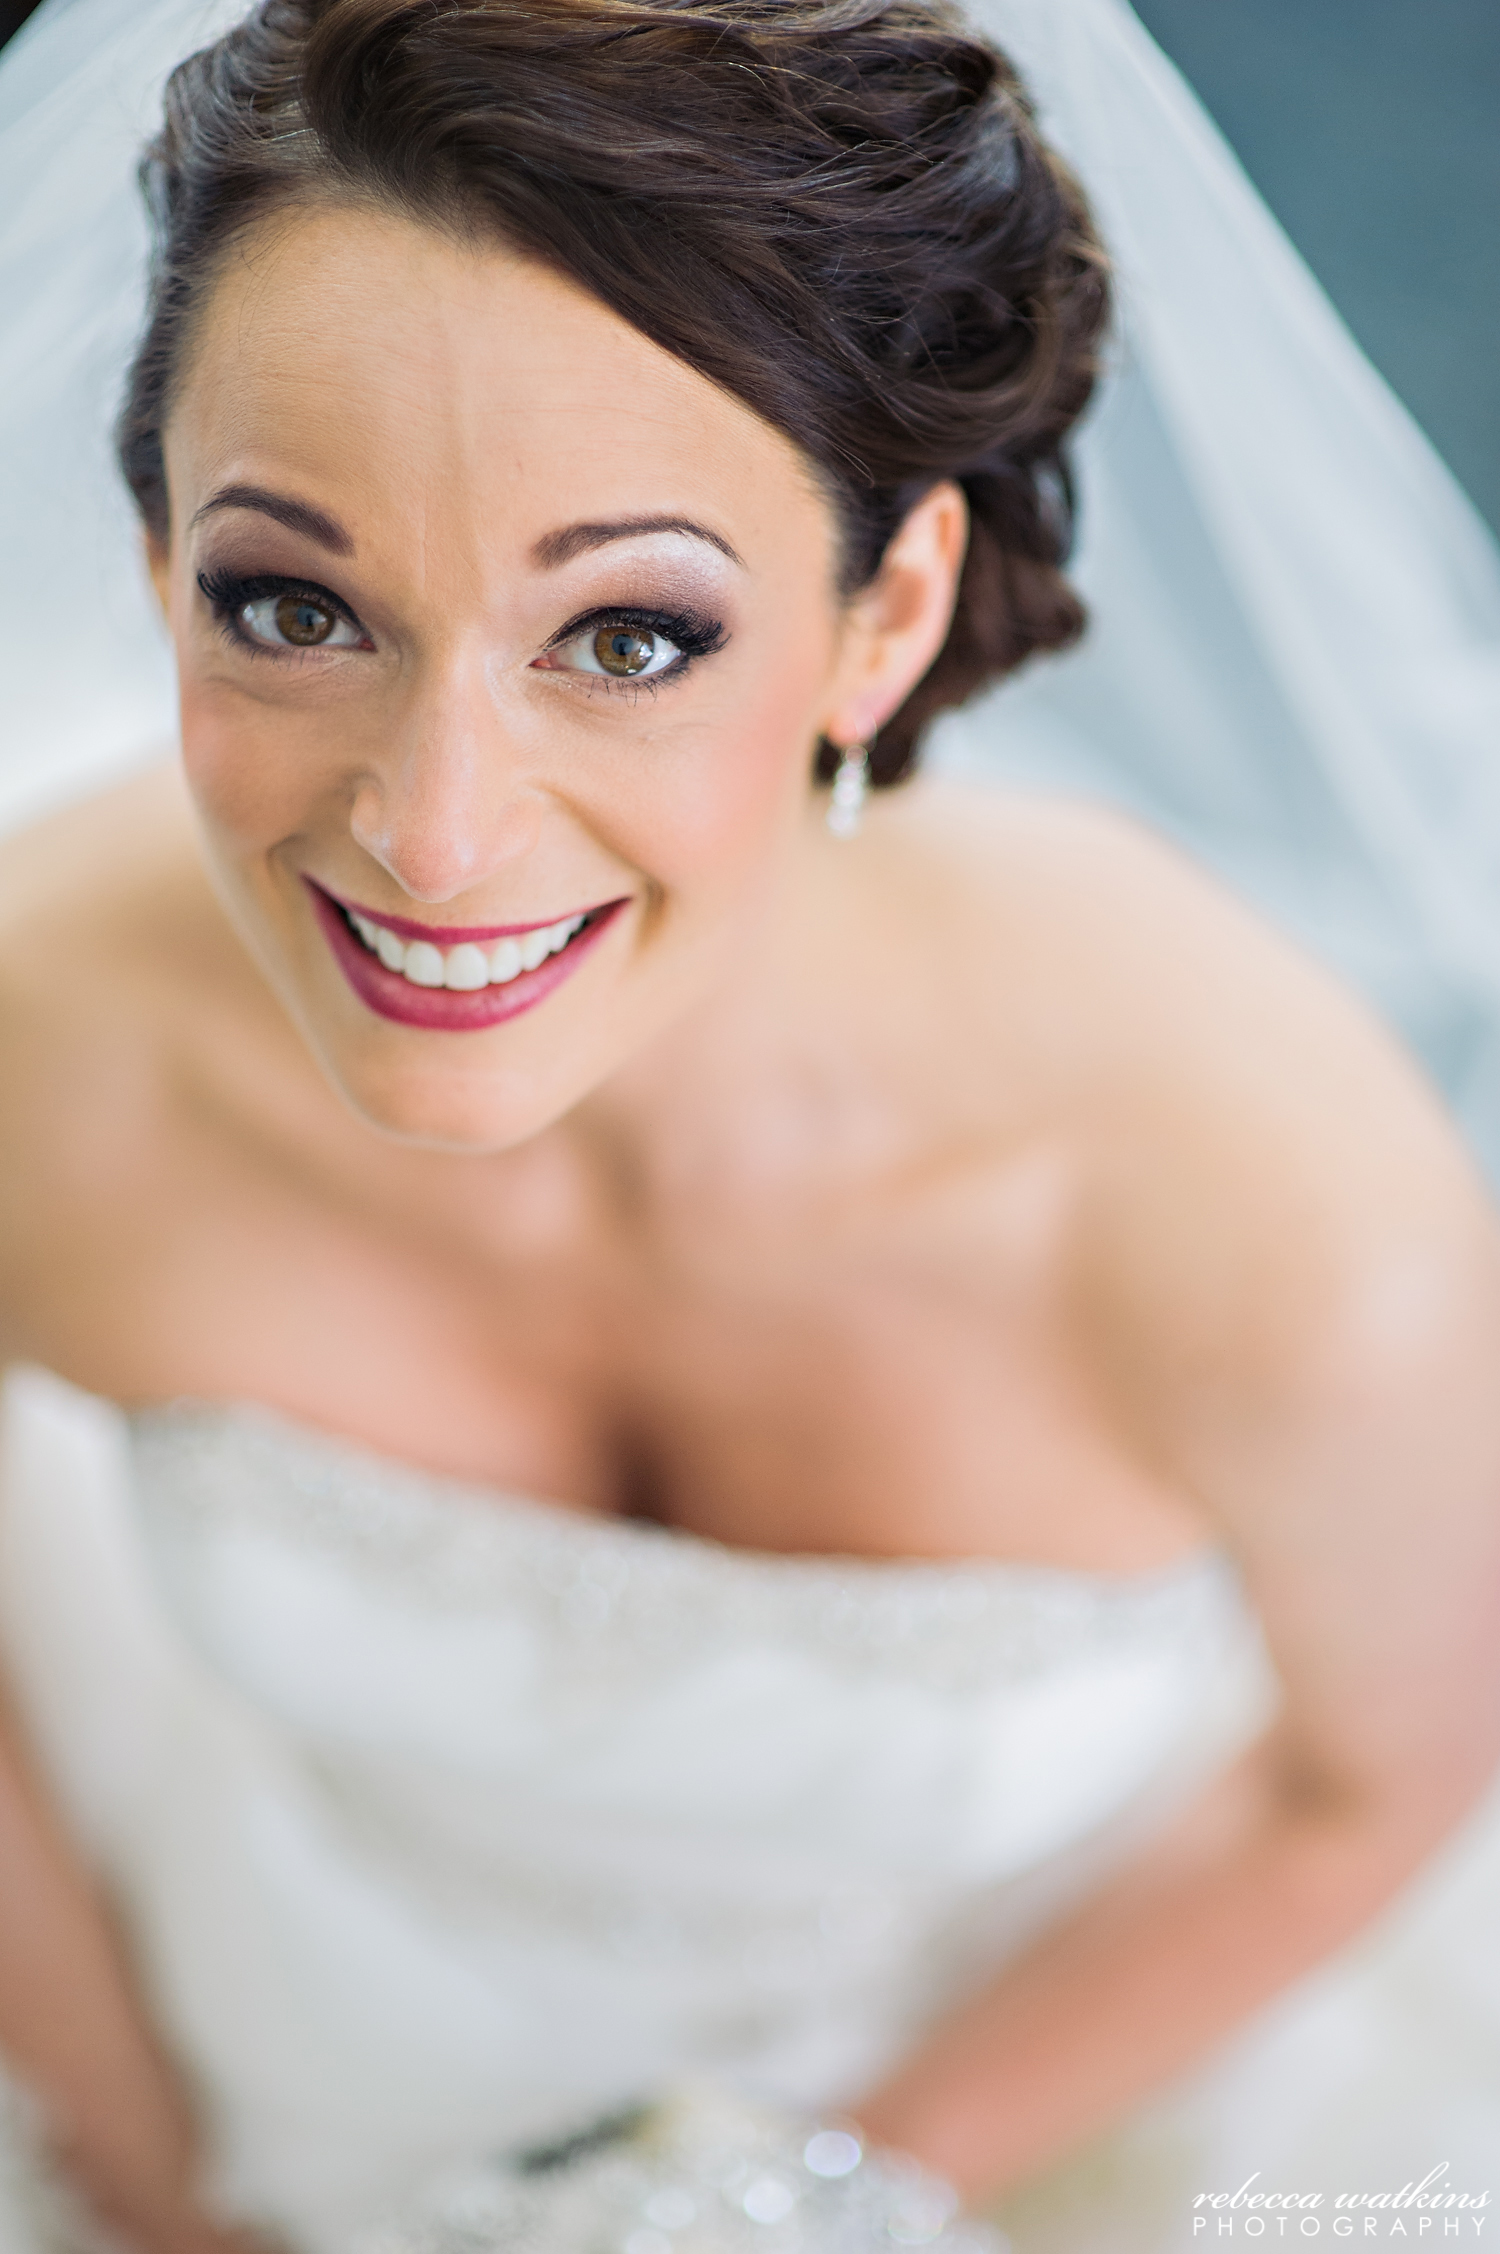 rebeccawatkinsphotographycarlylealexandriawedding-28.jpg